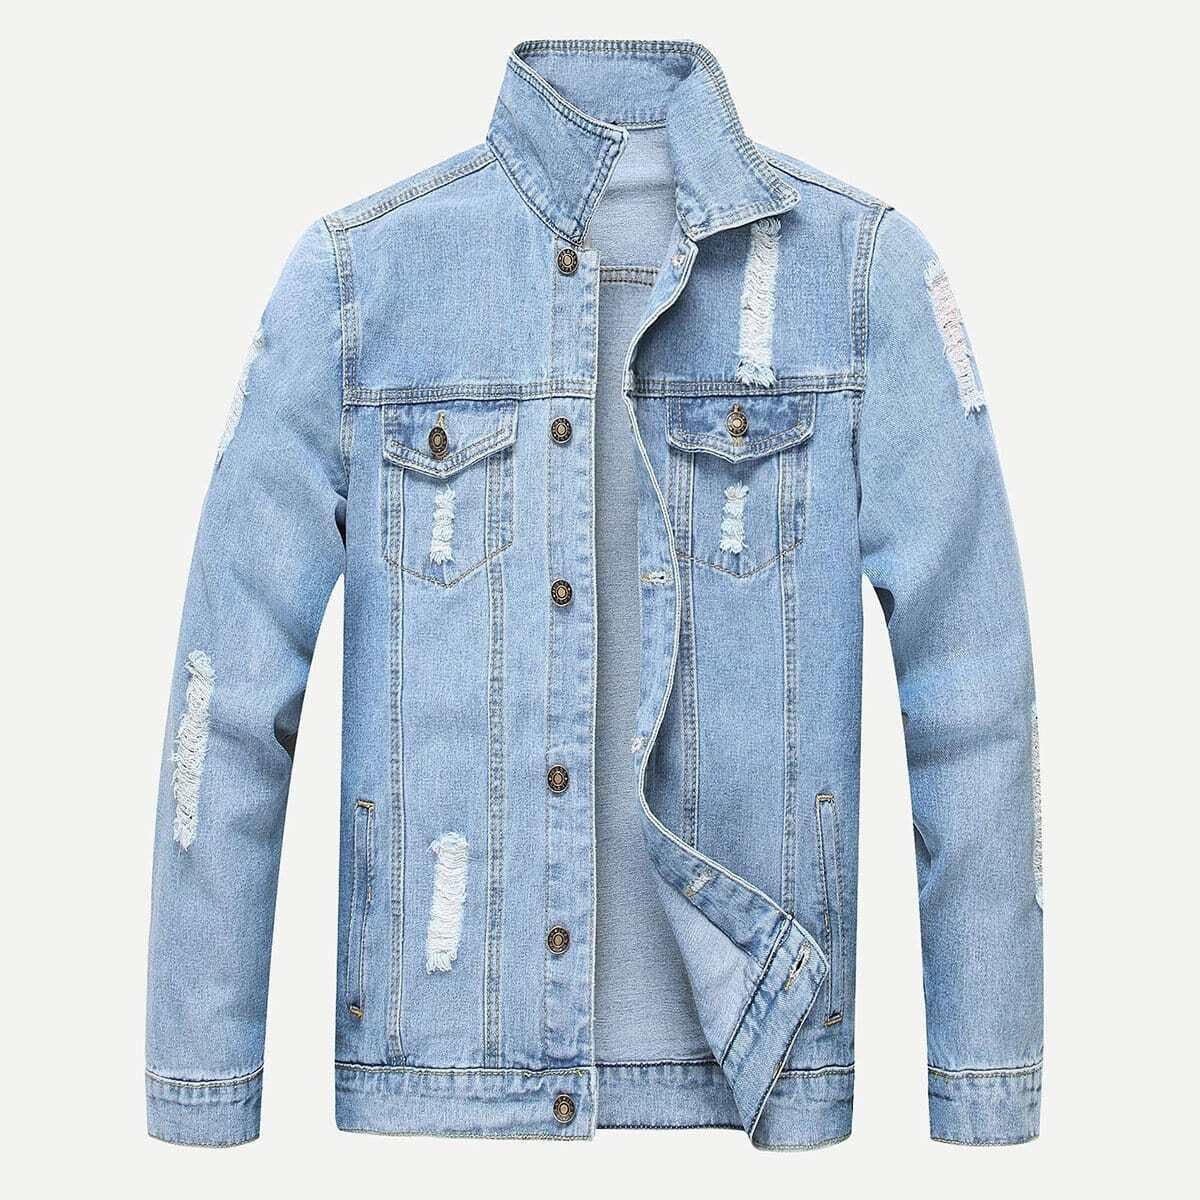 Blauw Casual Vlak Heren Jeans jassen Gescheurd